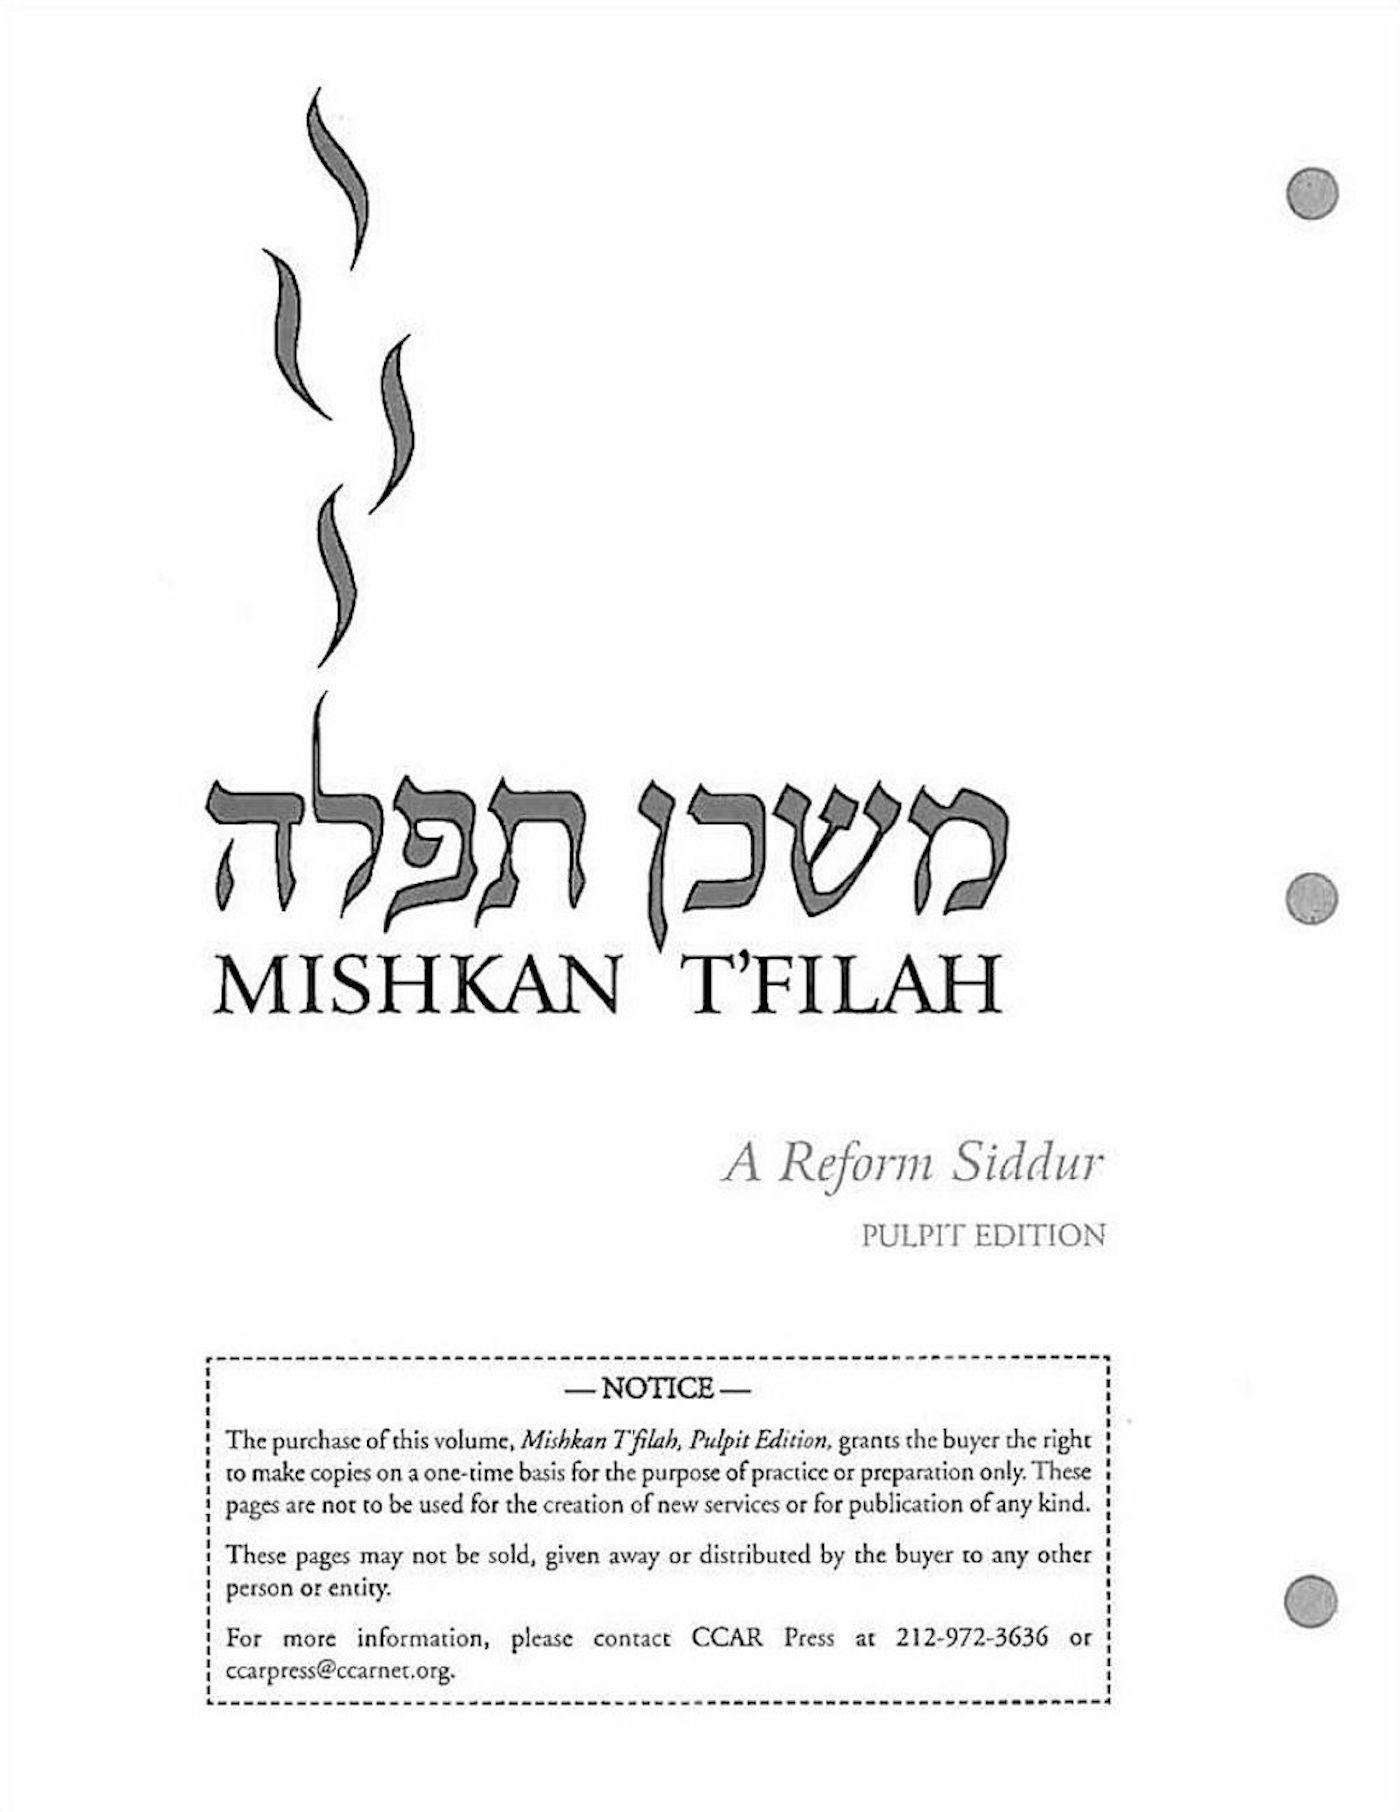 Mishkan T'filah: Pulpit Edition